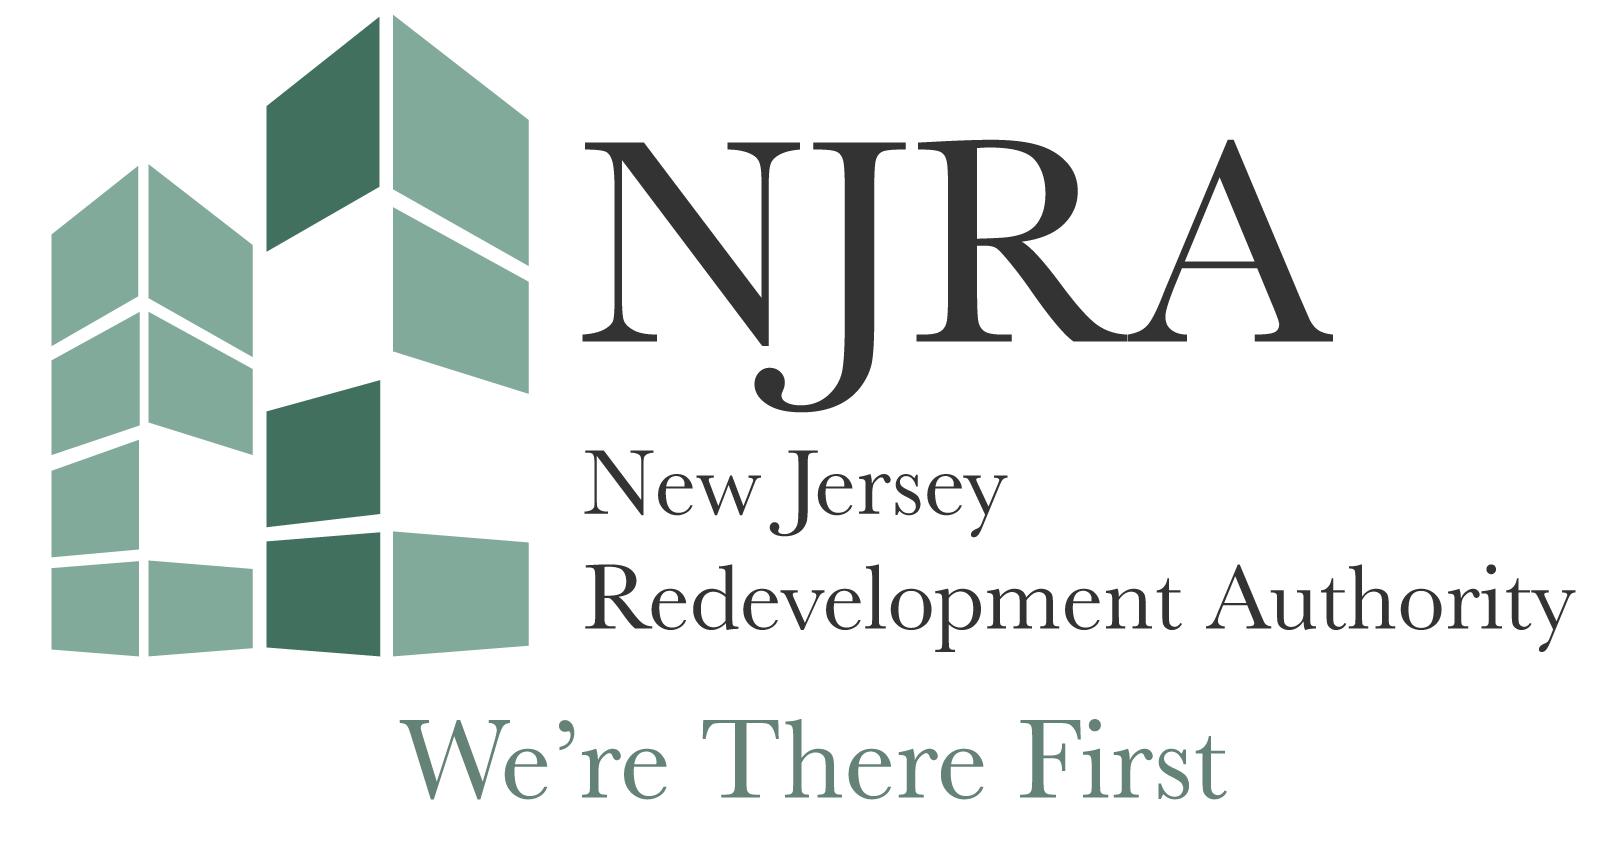 New JErsey Redevelopment Authority logo